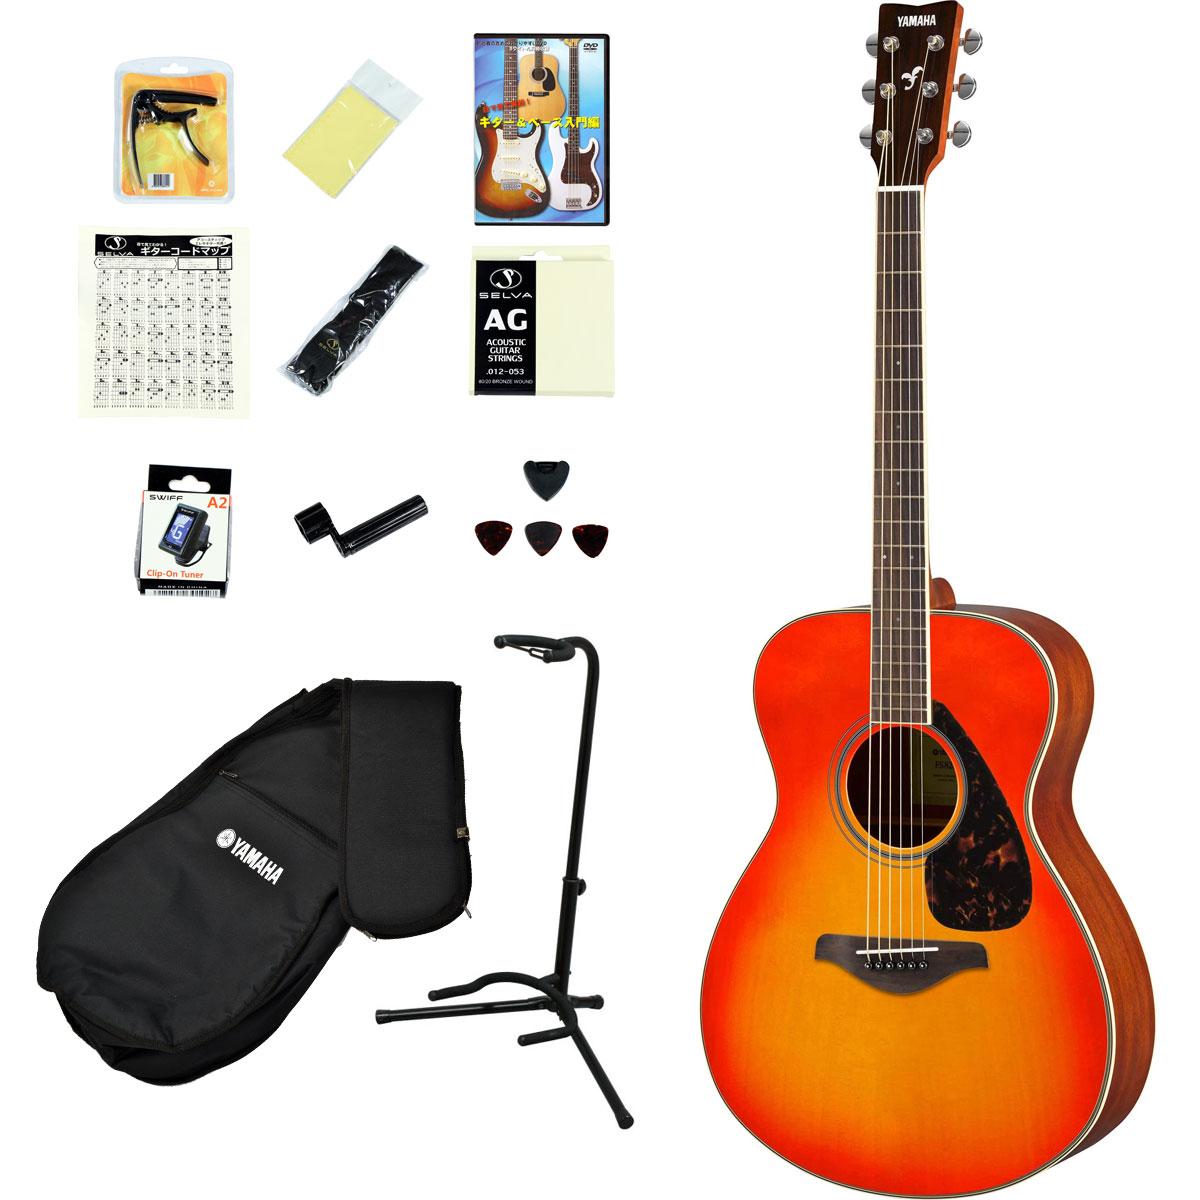 YAMAHA / FS820 AB(オータムバースト) 【アコースティックギター14点入門セット!】 ヤマハ フォークギター アコギ FS-820 入門 初心者【YRK】